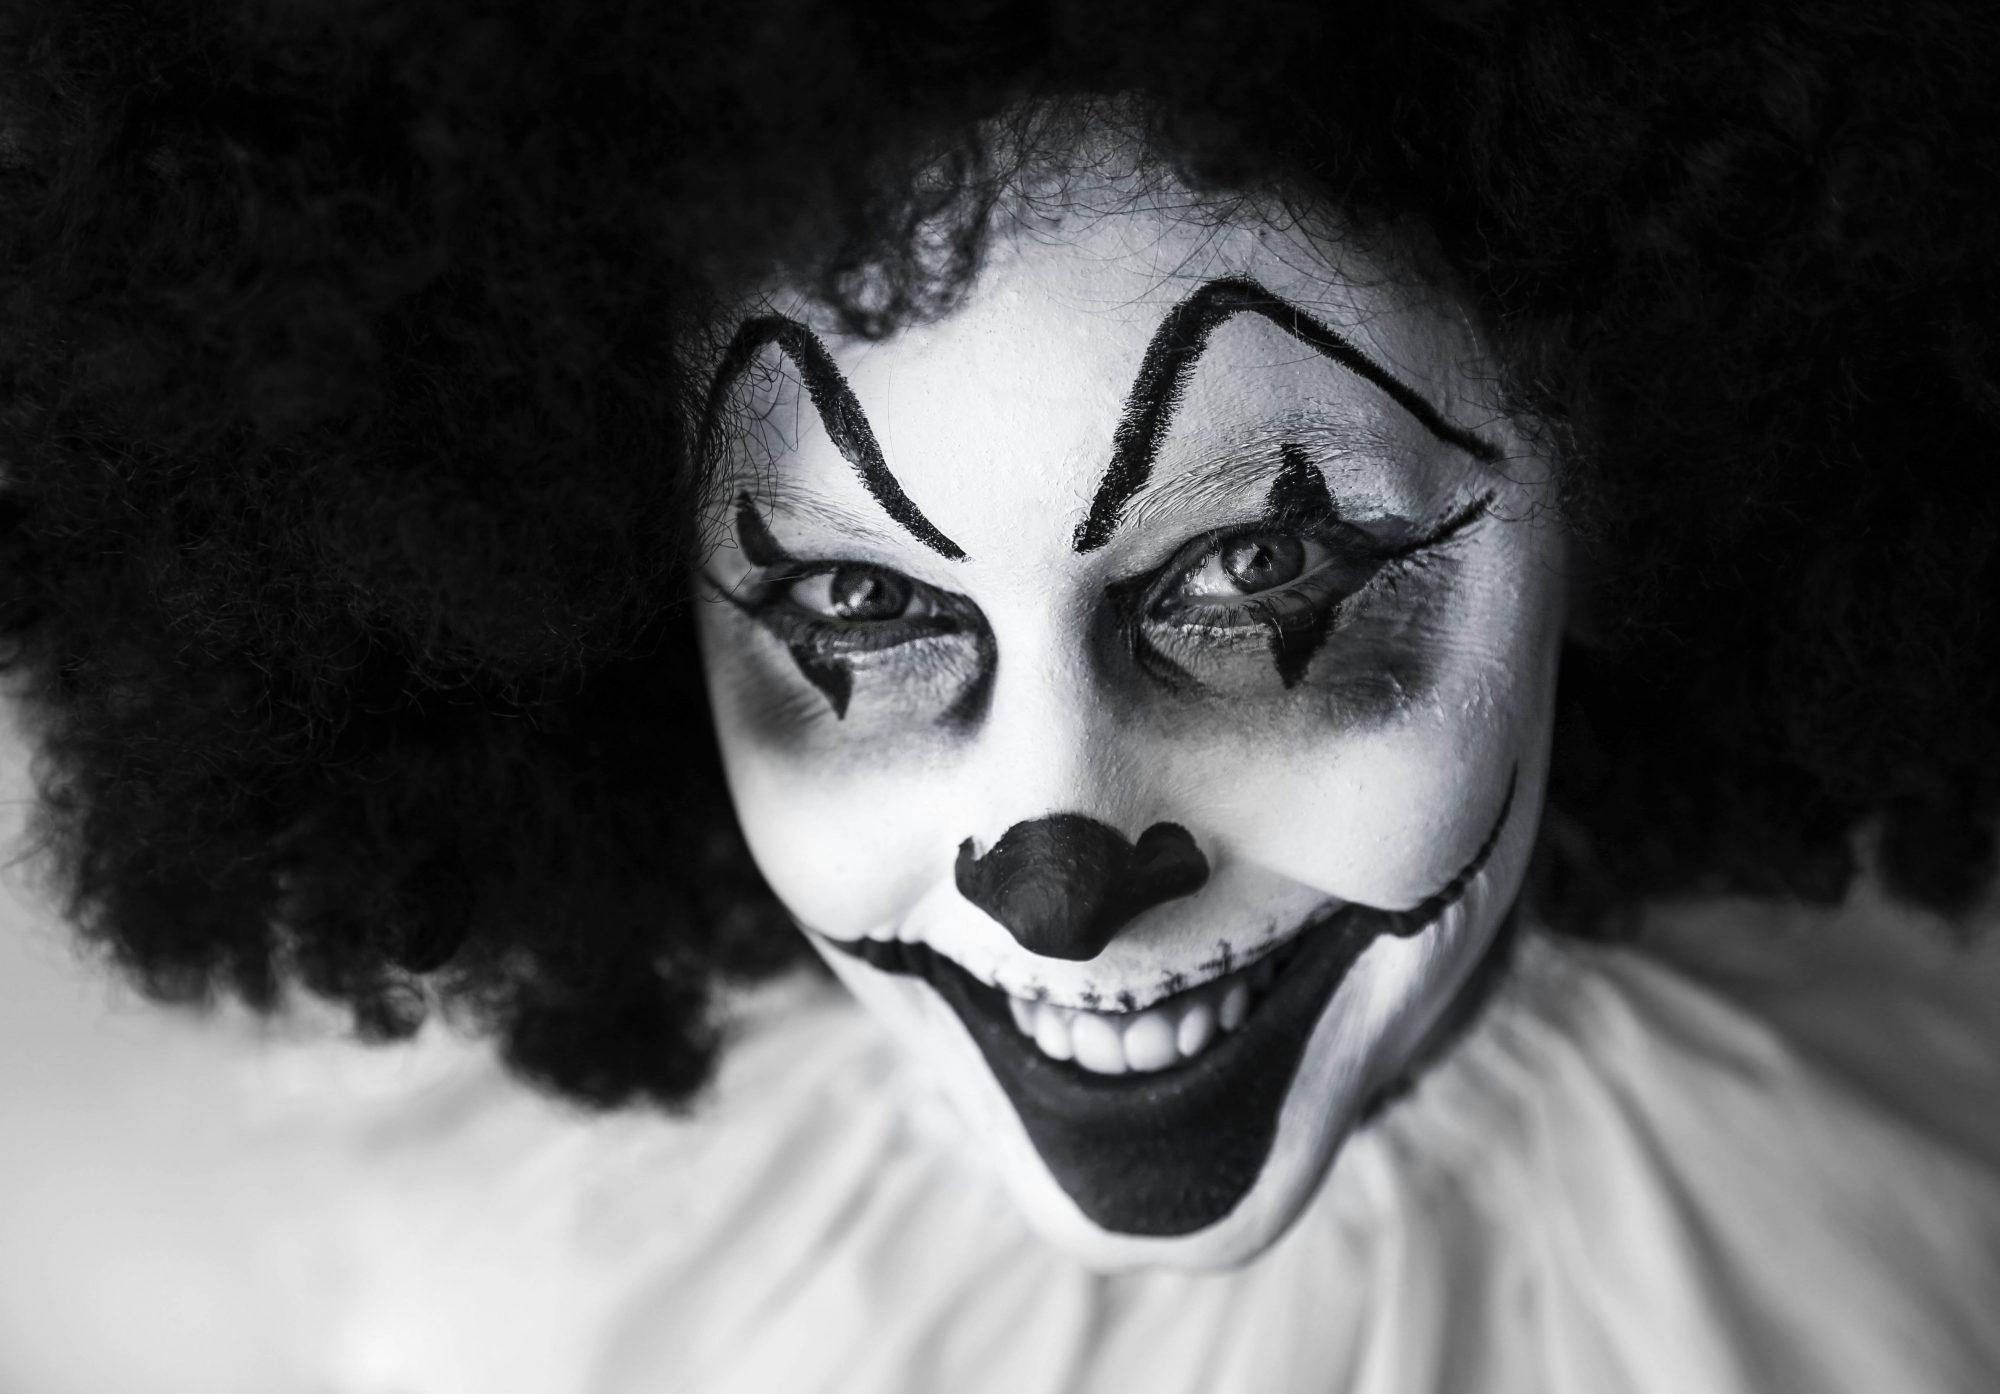 clown-creepy-grinning-facepaint-39242-1